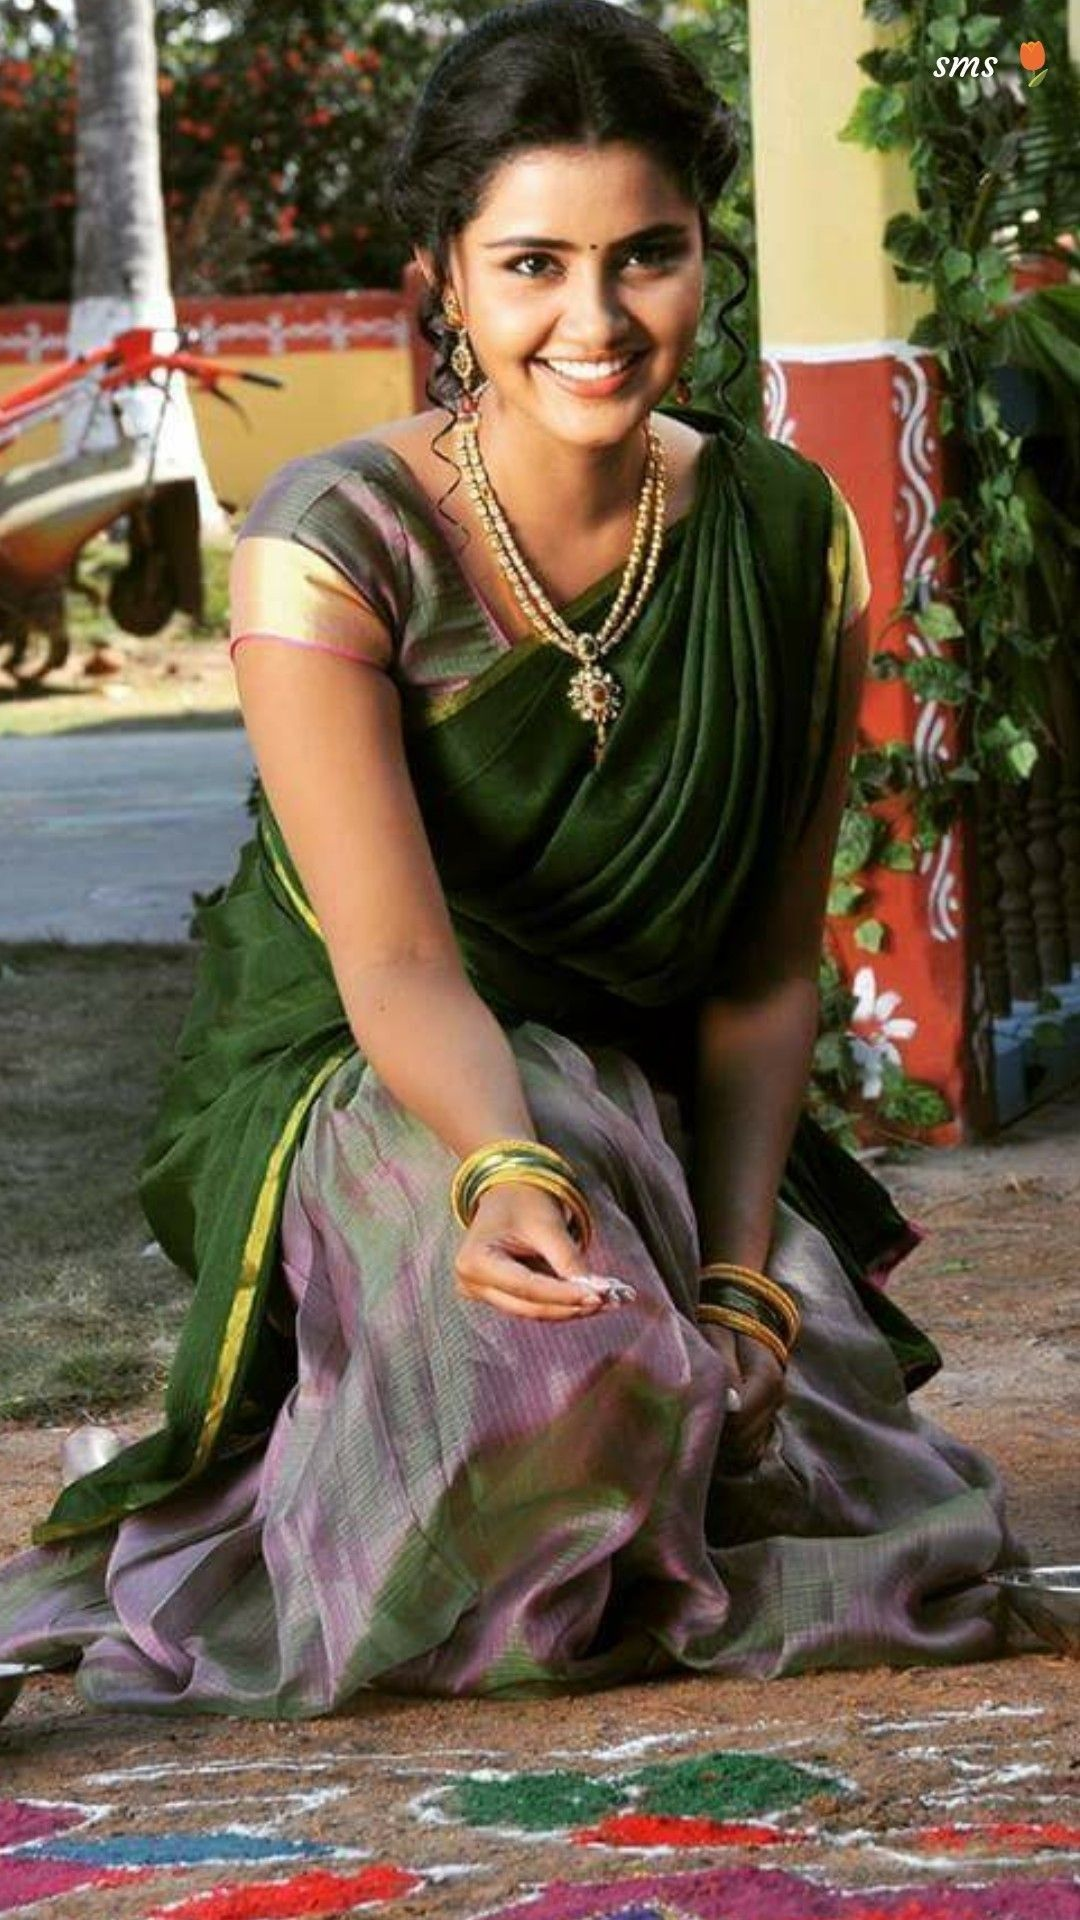 Pin By Anu On Half Saree Most Beautiful Bollywood Actress Most Beautiful Indian Actress Indian Actress Hot Pics